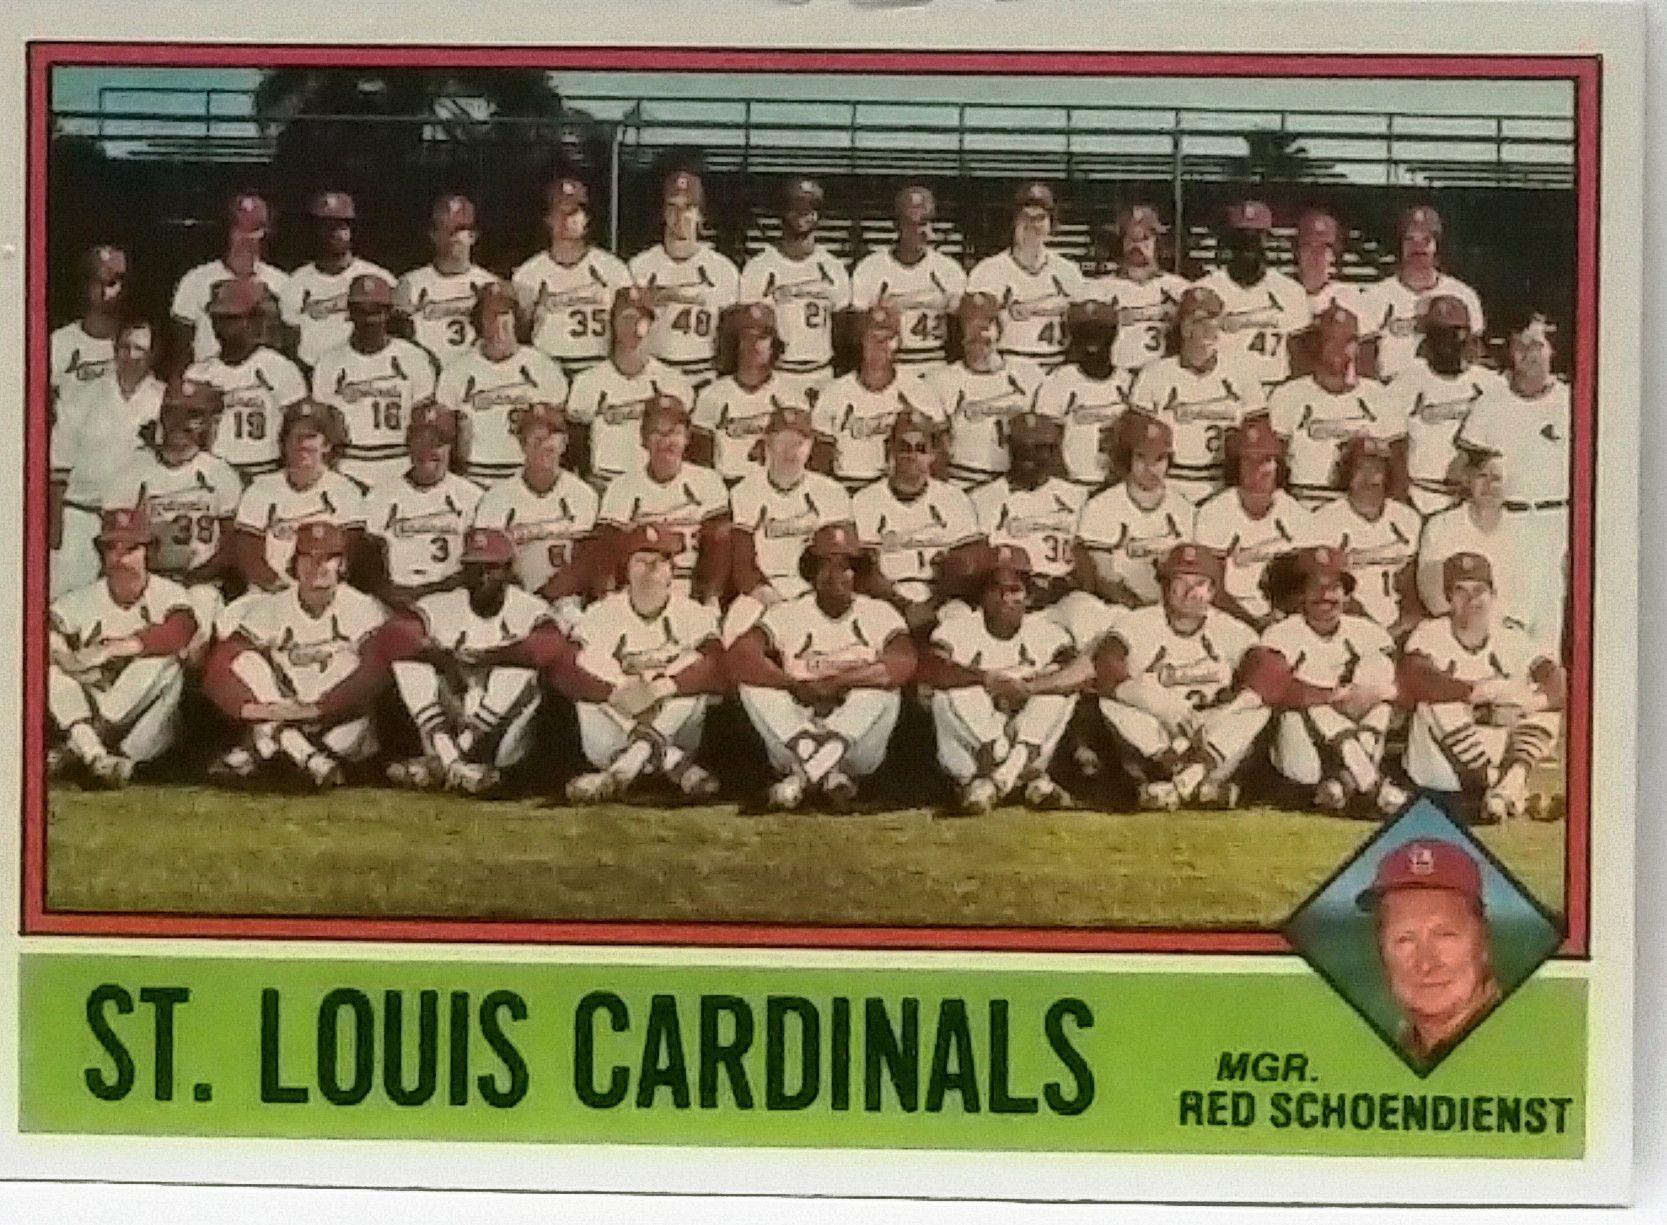 1976 Topps #581 St. Louis Cardinals Team Card, 9 MINT, w/Brock, Hernandez, Hrabosky, Denny, Schoendienst